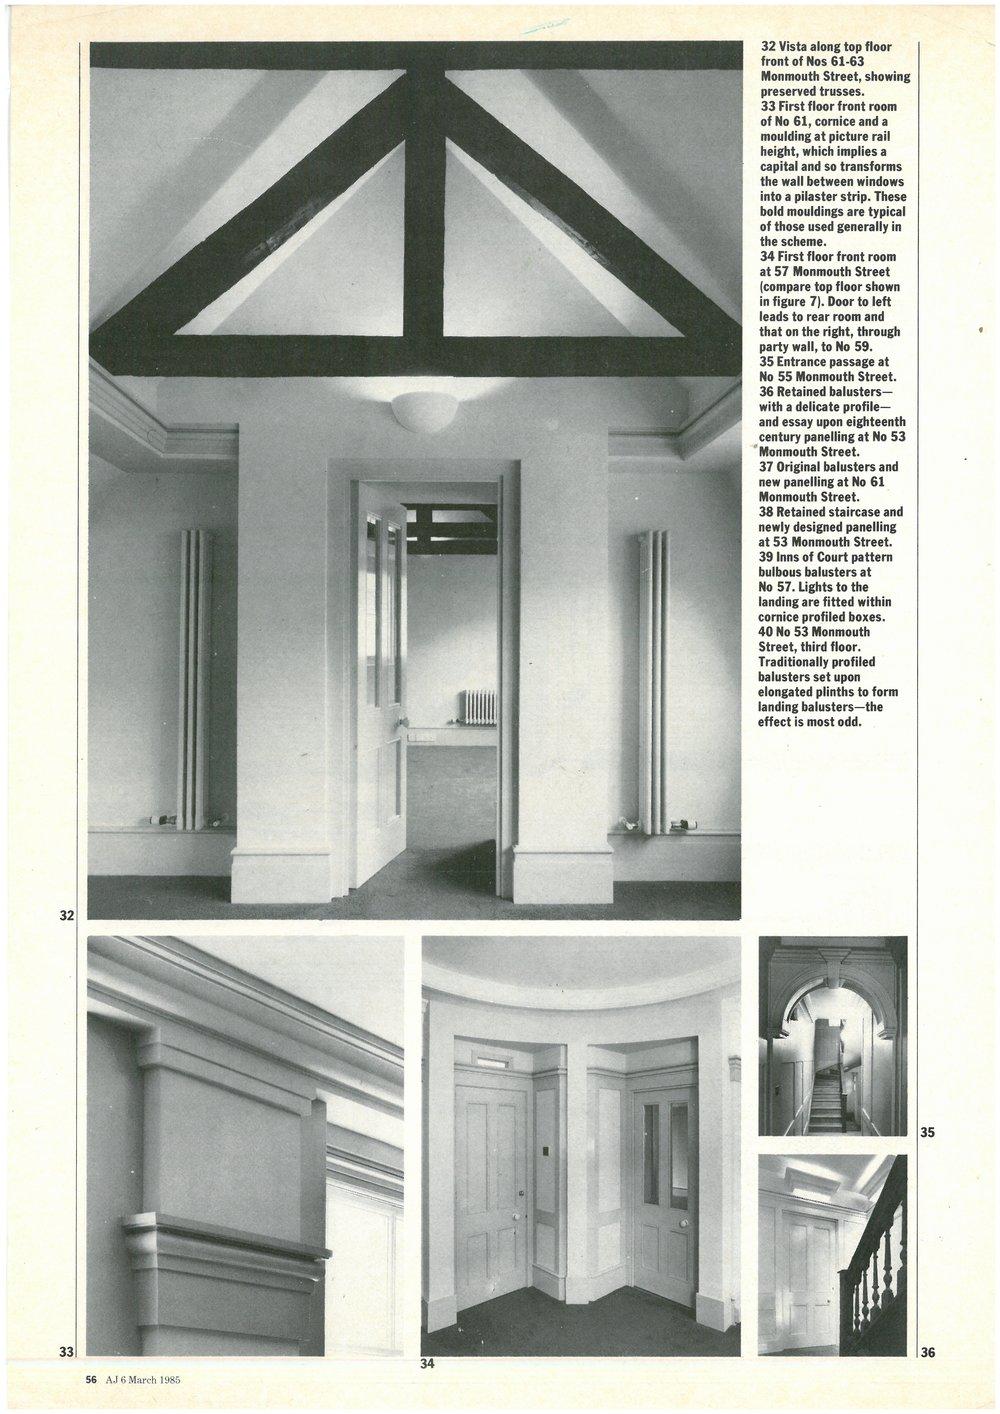 Comyn Ching Triangle_AJ 06 March1985_Page_10.jpg